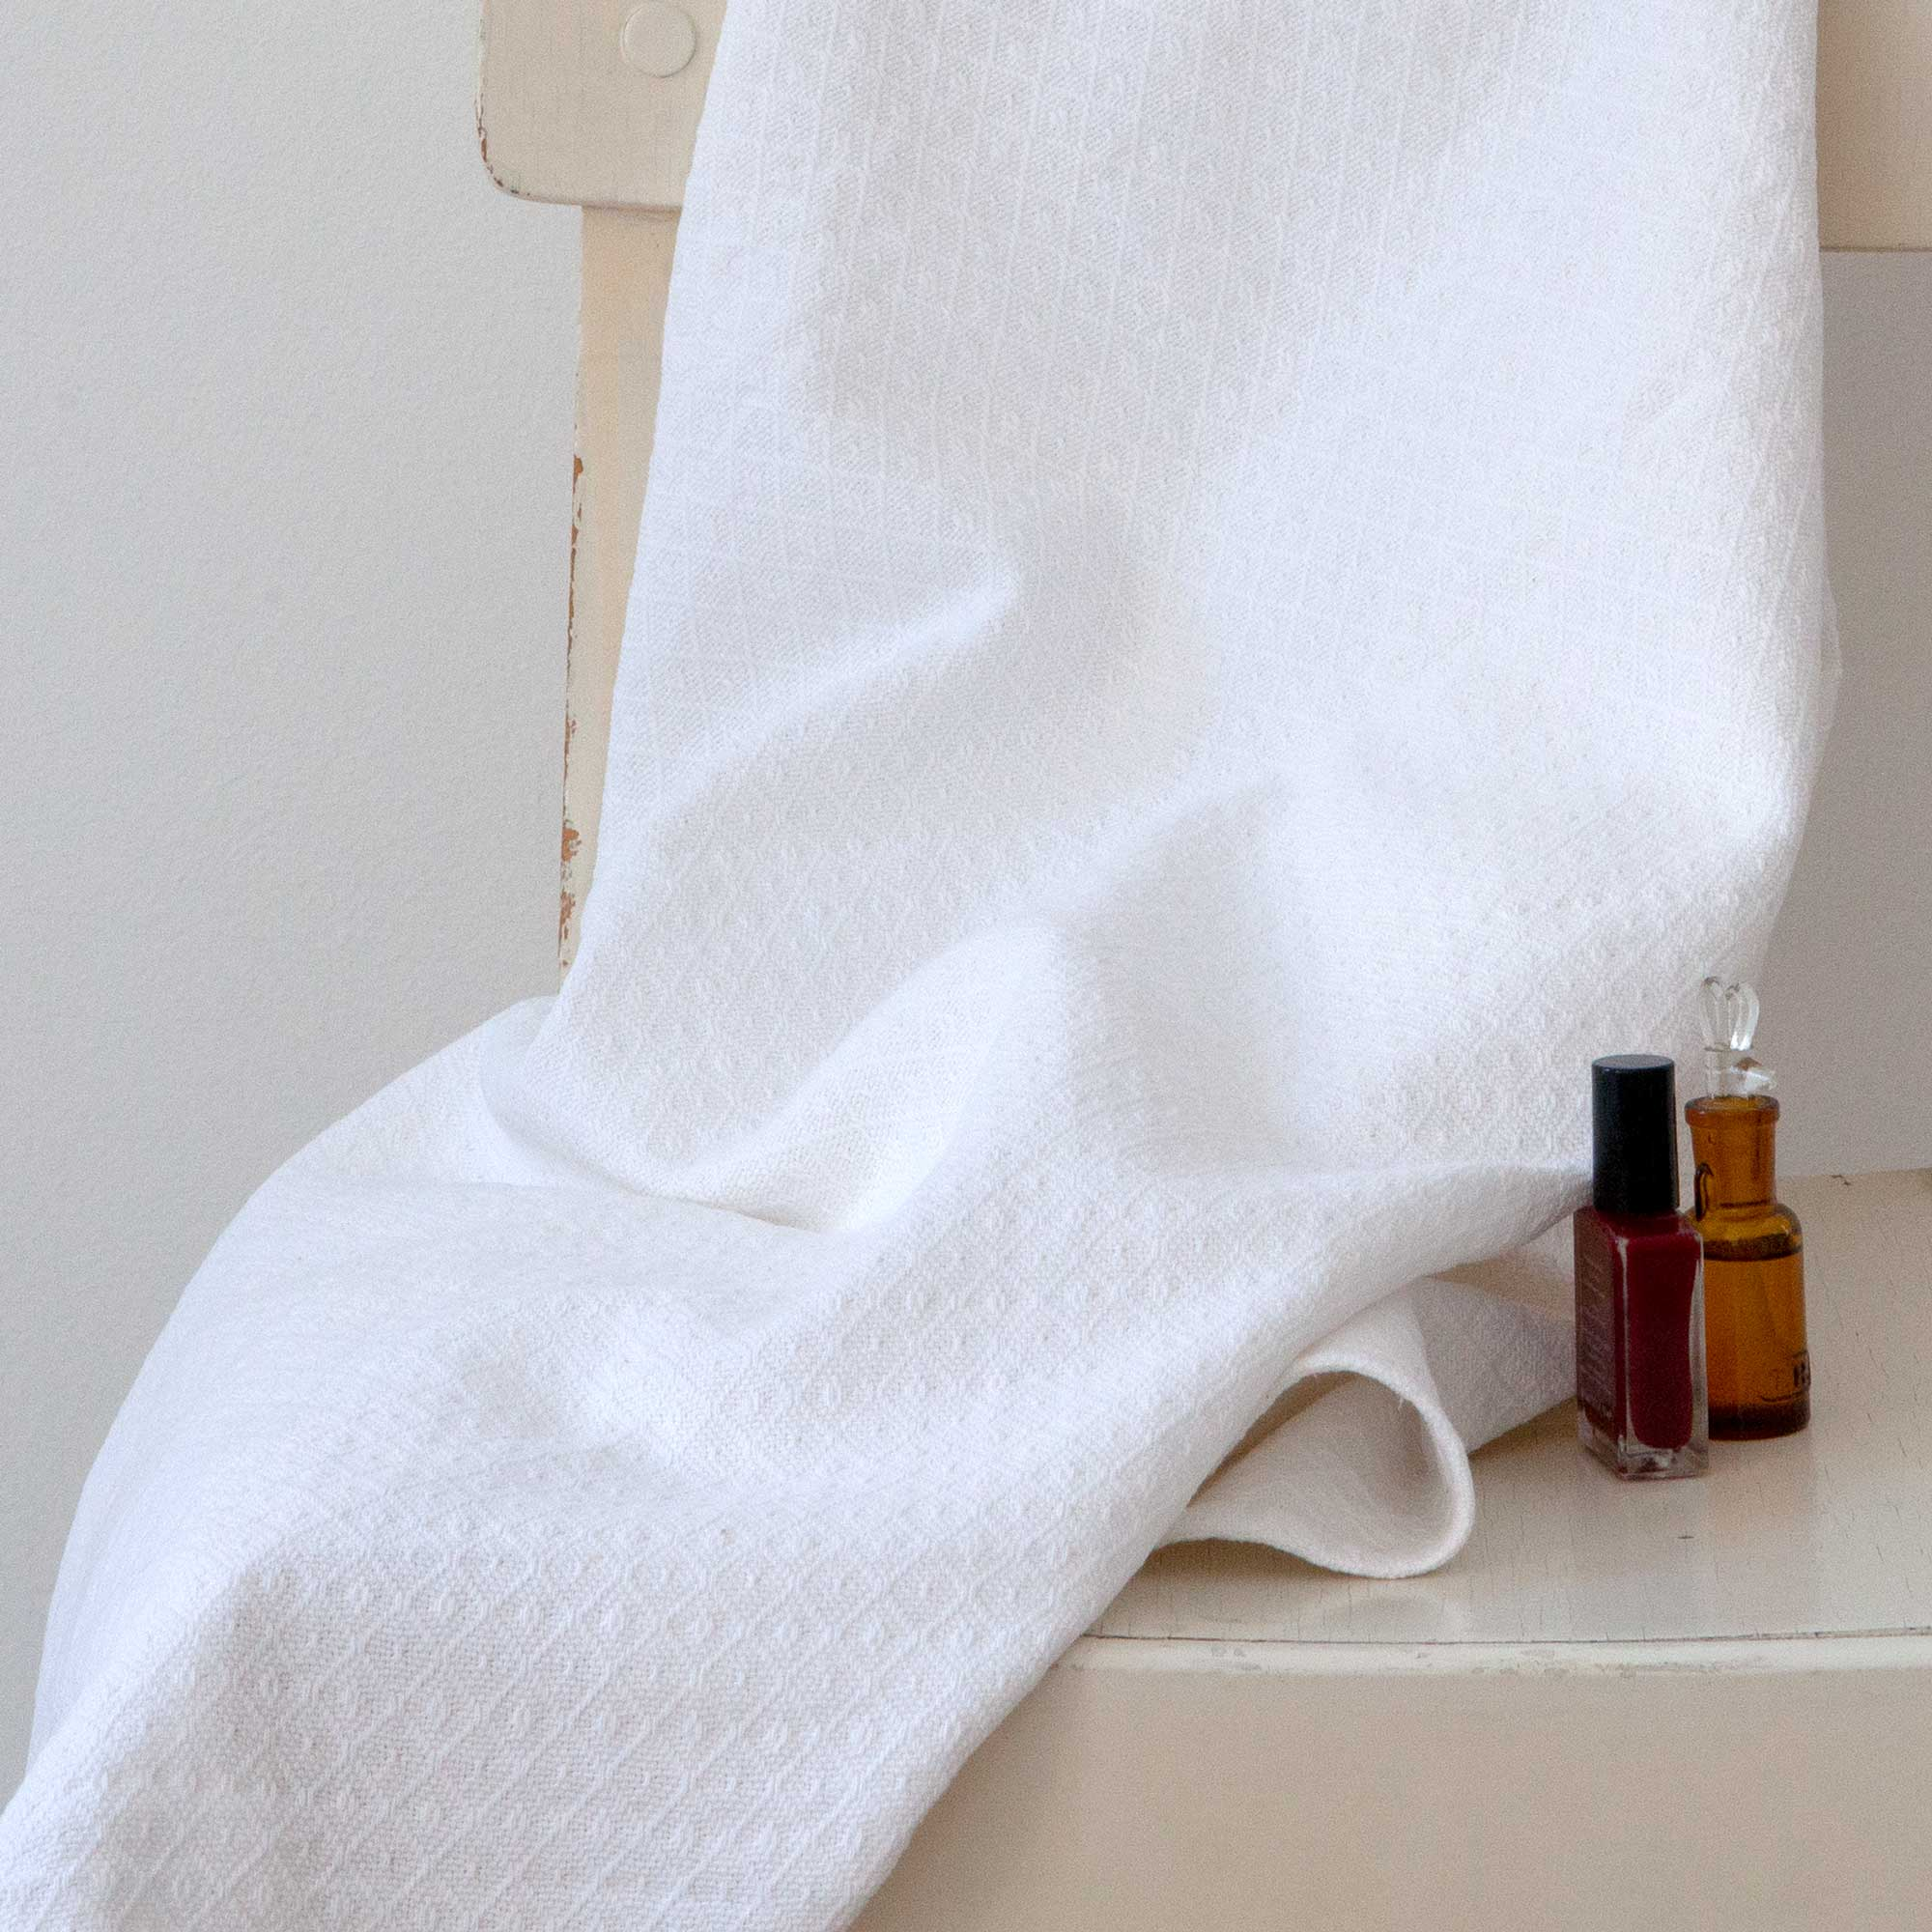 Bath towel, Harlequin, 100% cotton, Selected by RosenbergCph